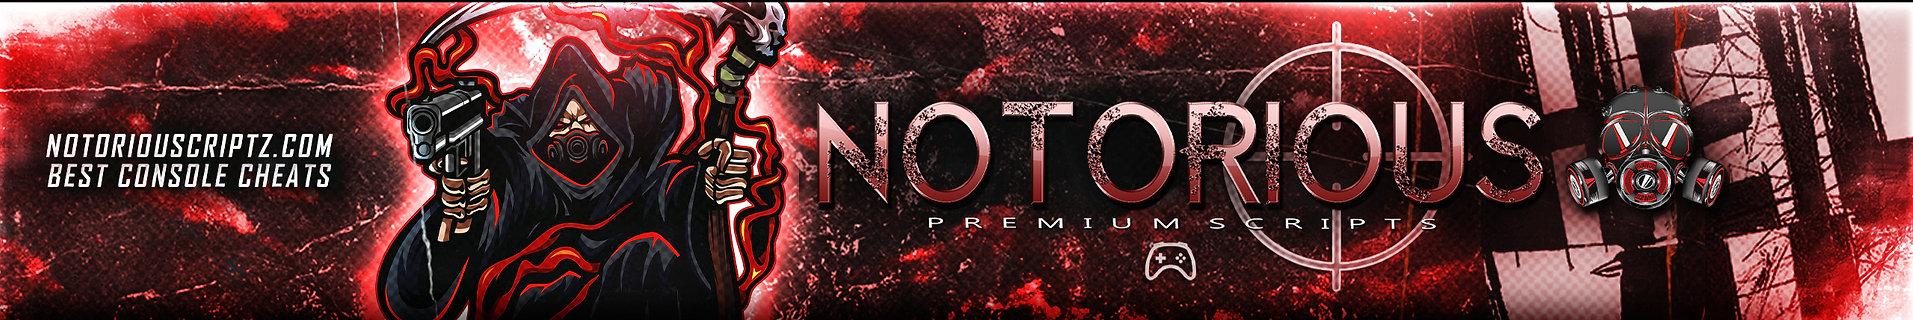 NOTORIOUSCRIPTZ-youtube-banner_edited.jp